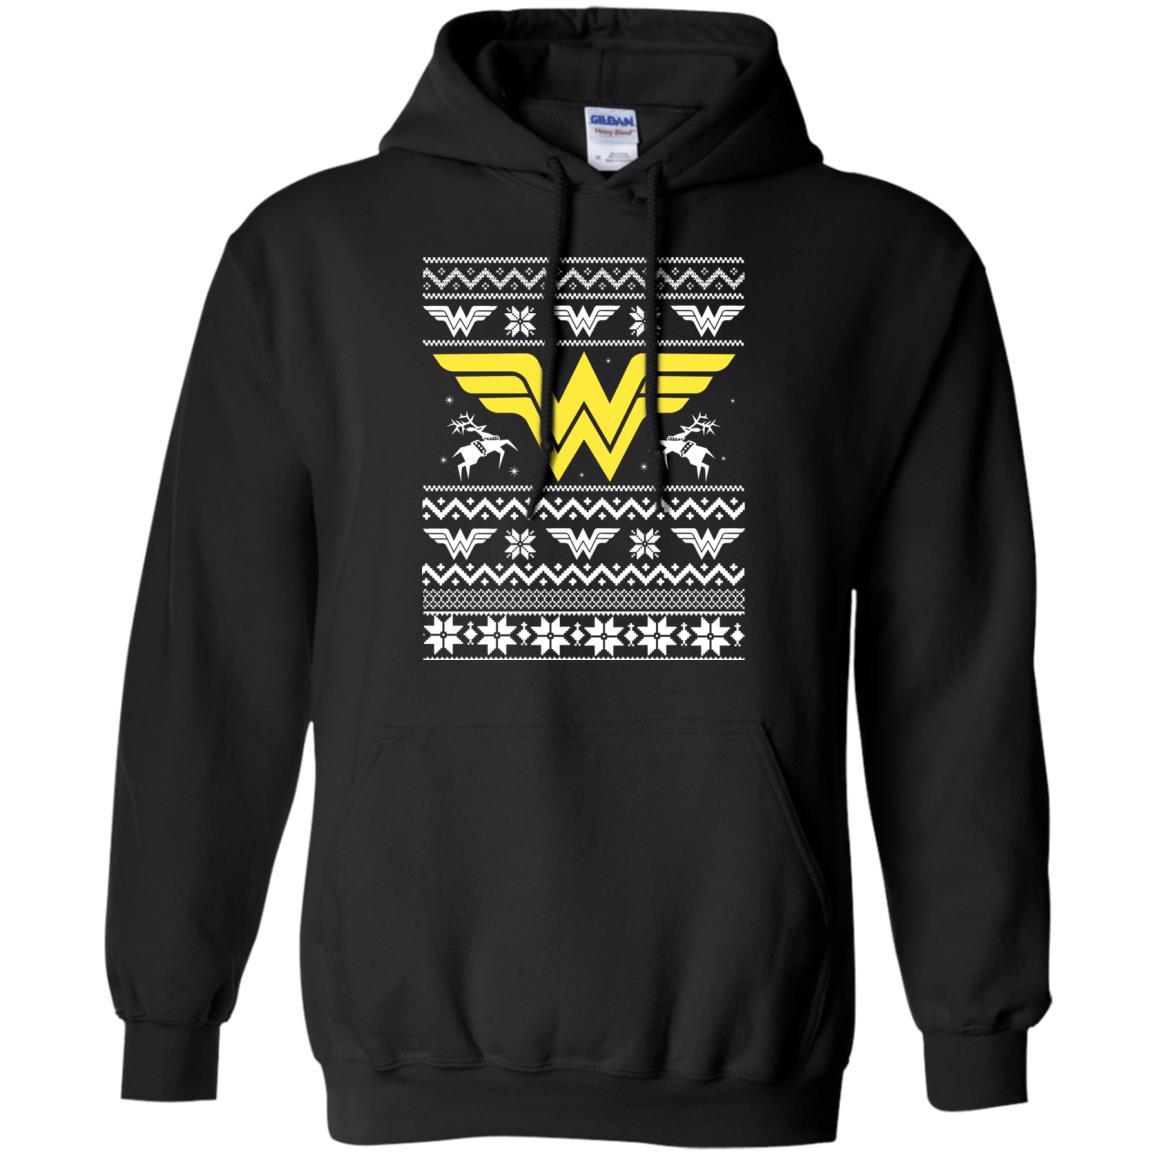 image 1967 - Wonder Woman Christmas Ugly Sweater, Hoodie